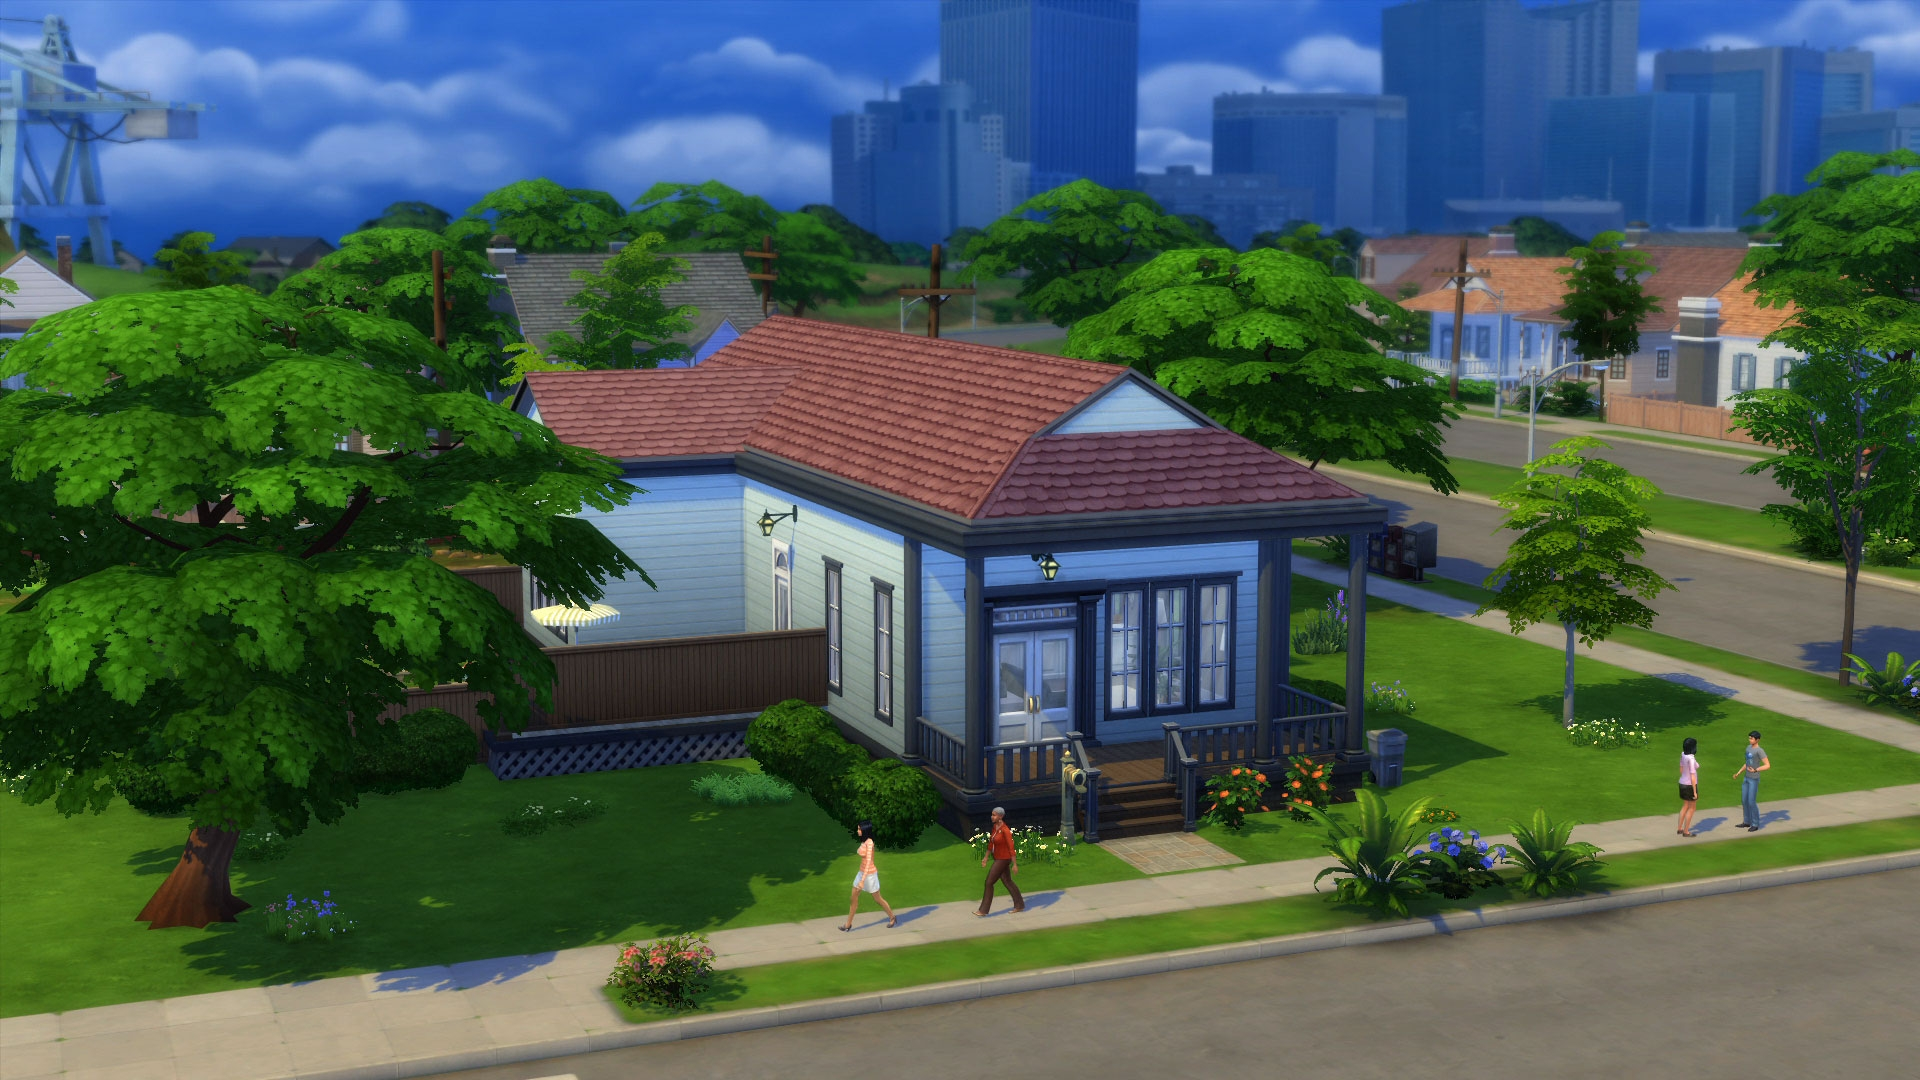 [Noticia]Reportajes de Los Sims 4: Pekesims 14377697153_774b5e4c0e_o